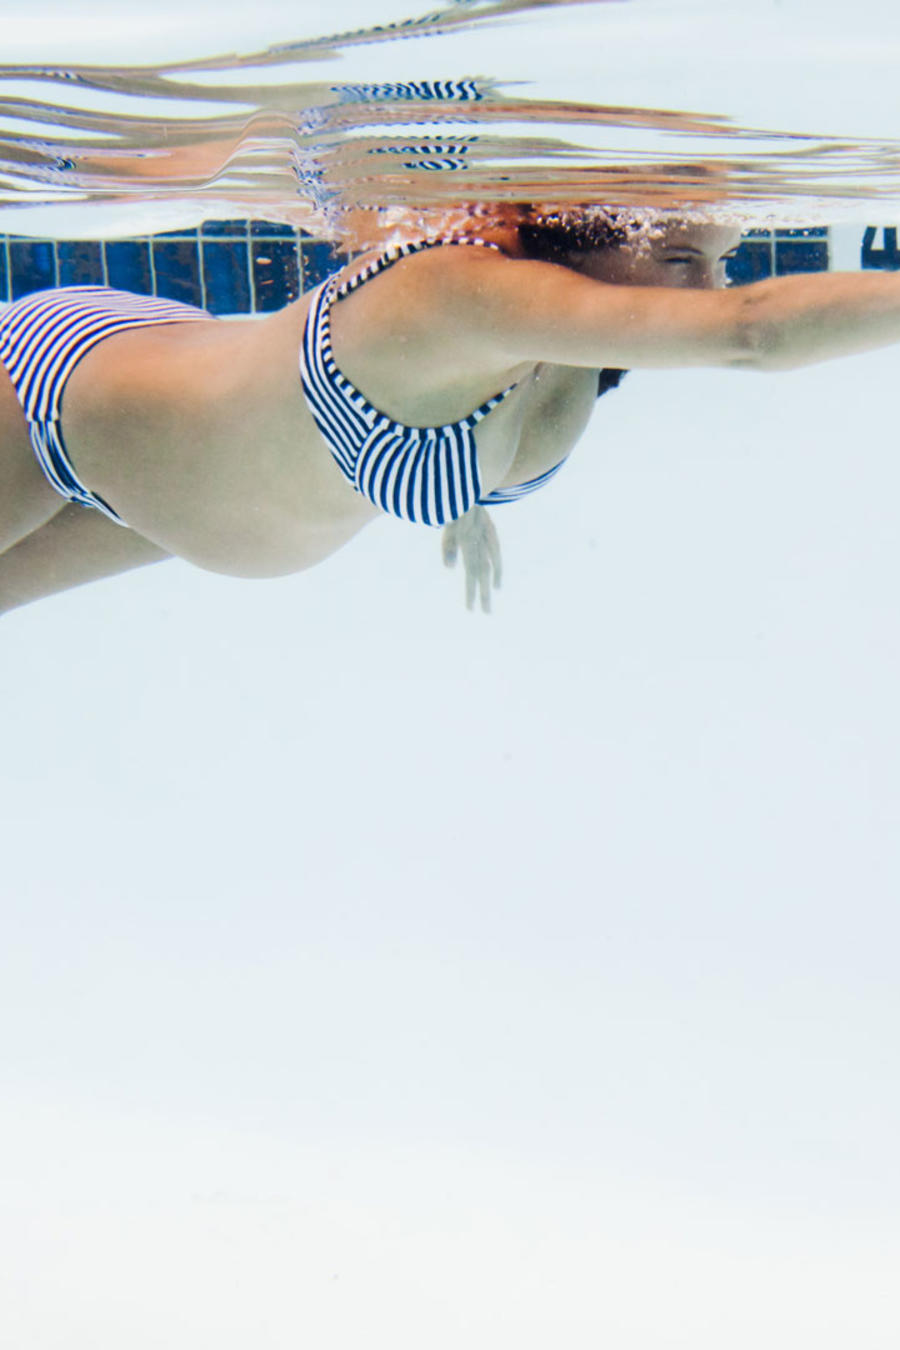 Mujer embarazada nadando